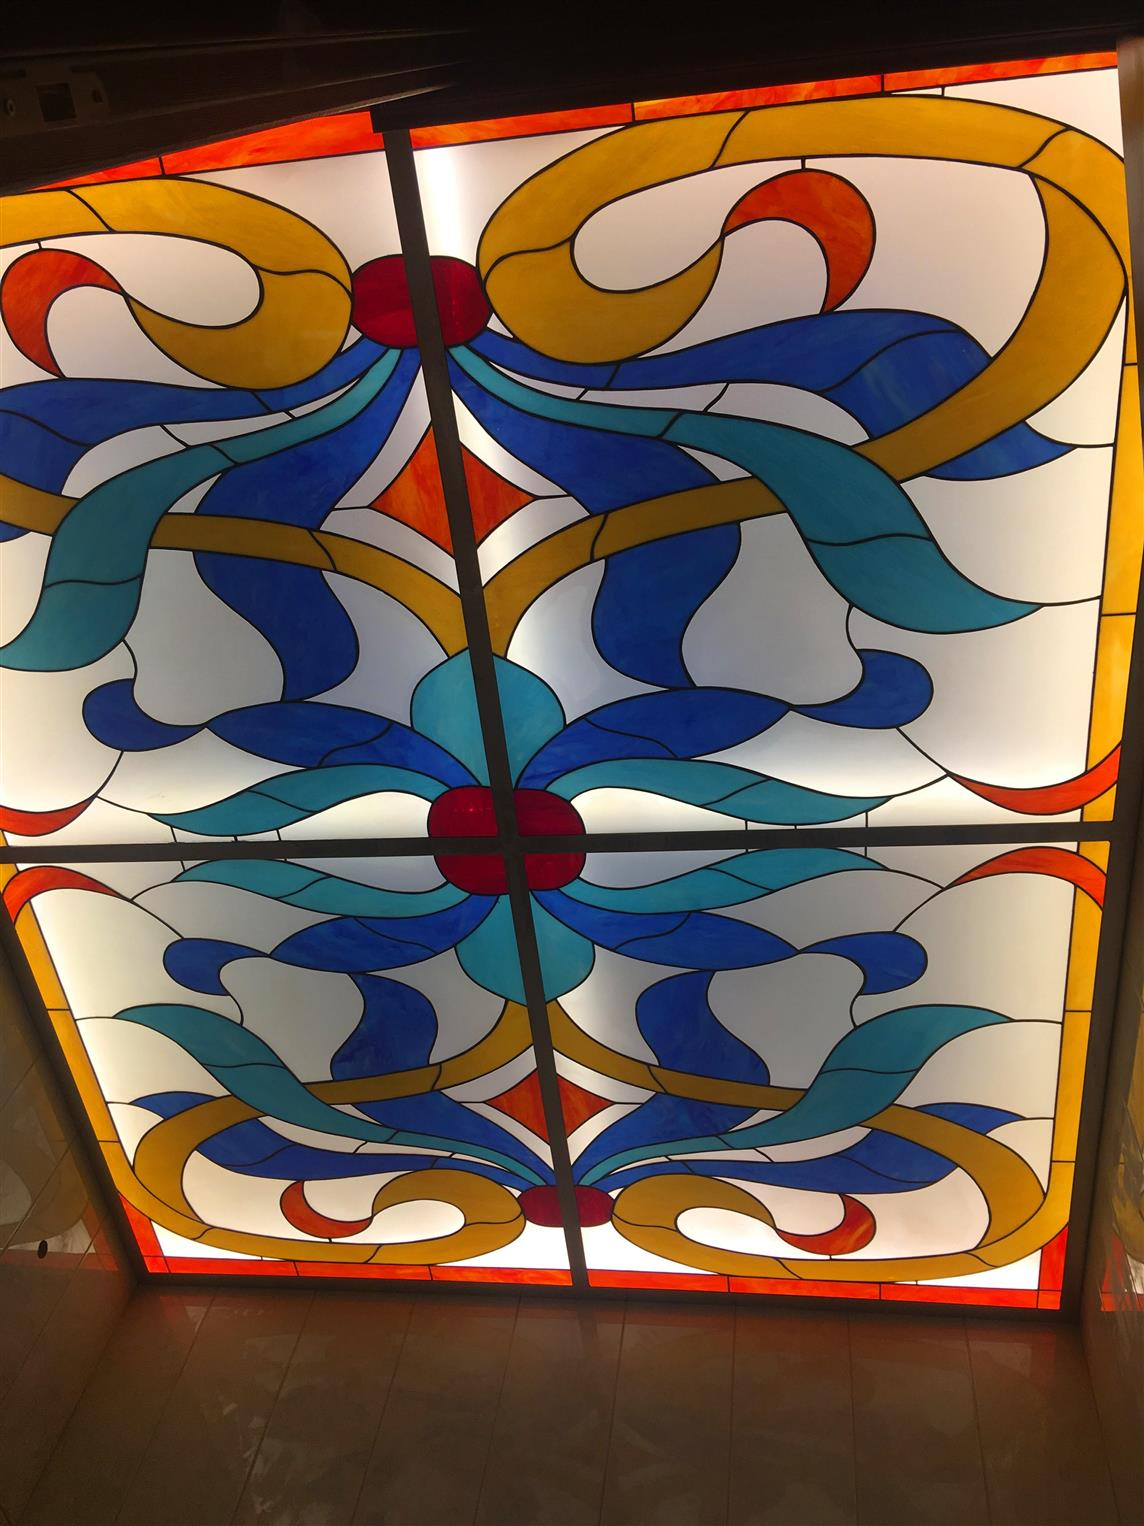 hamam-banyo-tavan-vitraylari20171221185310557.jpg izmir vitray çalışması